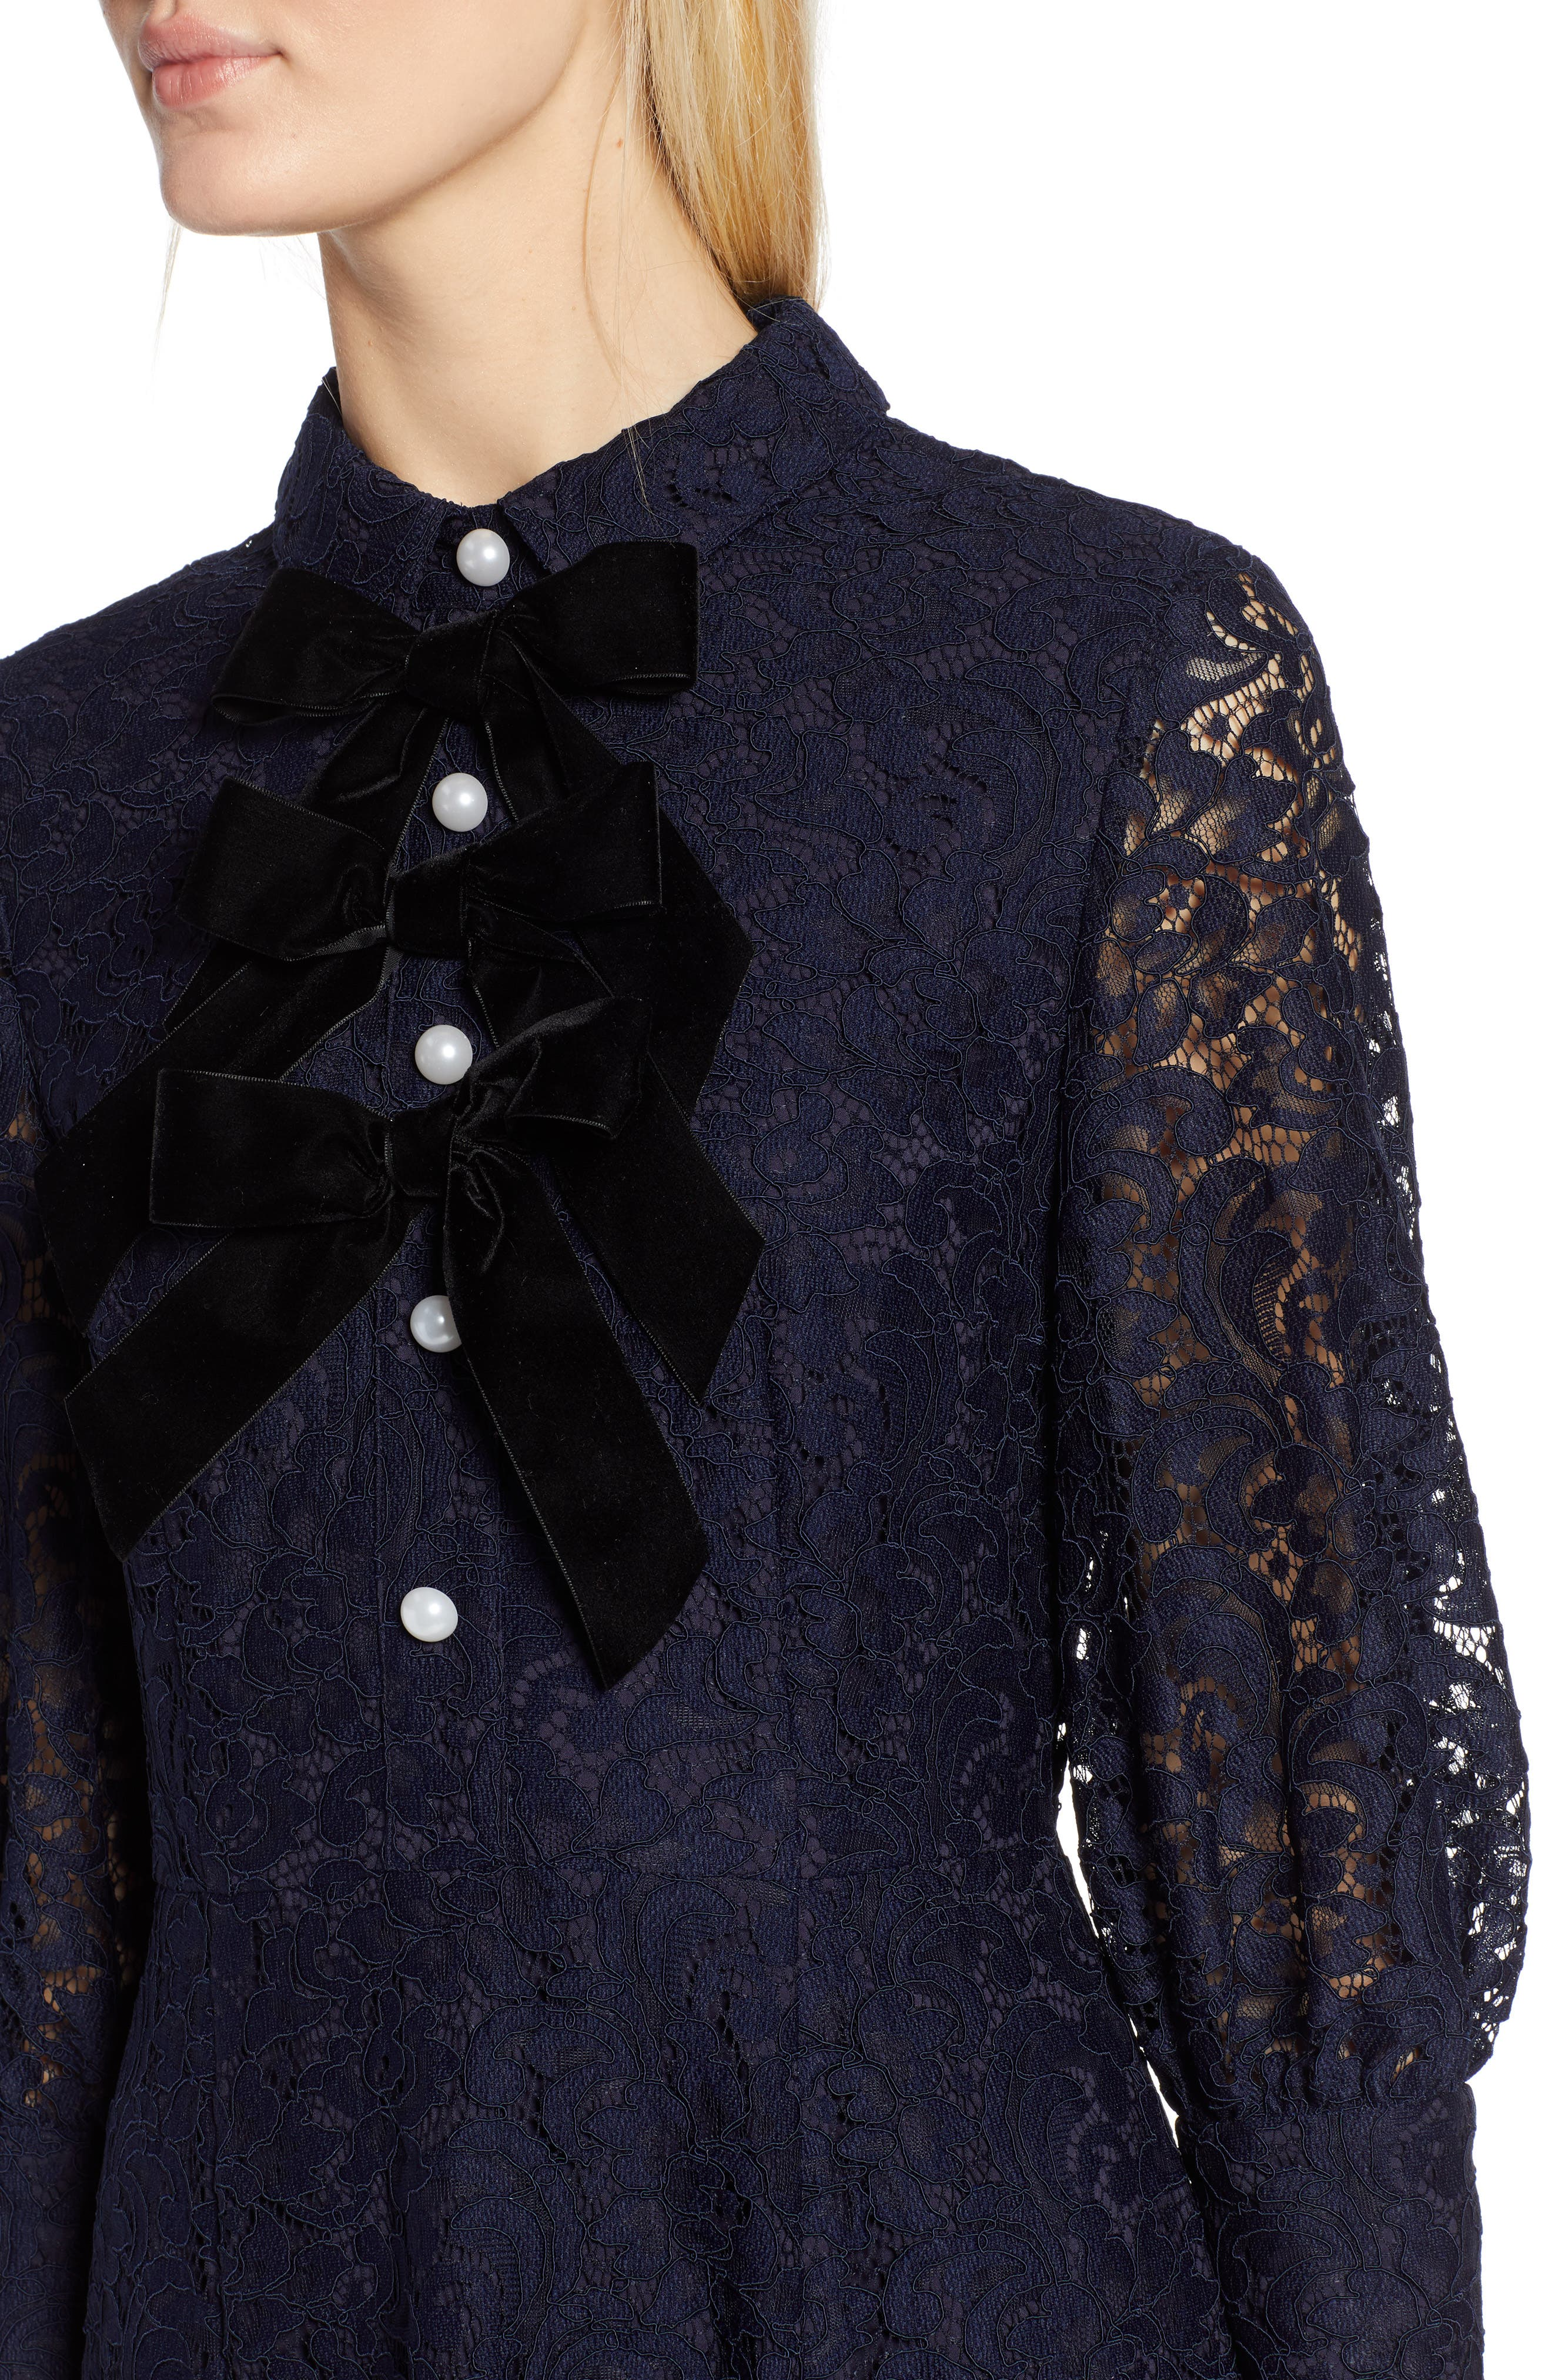 x Atlantic-Pacific Bow Detail Lace Midi Dress,                             Alternate thumbnail 5, color,                             NAVY